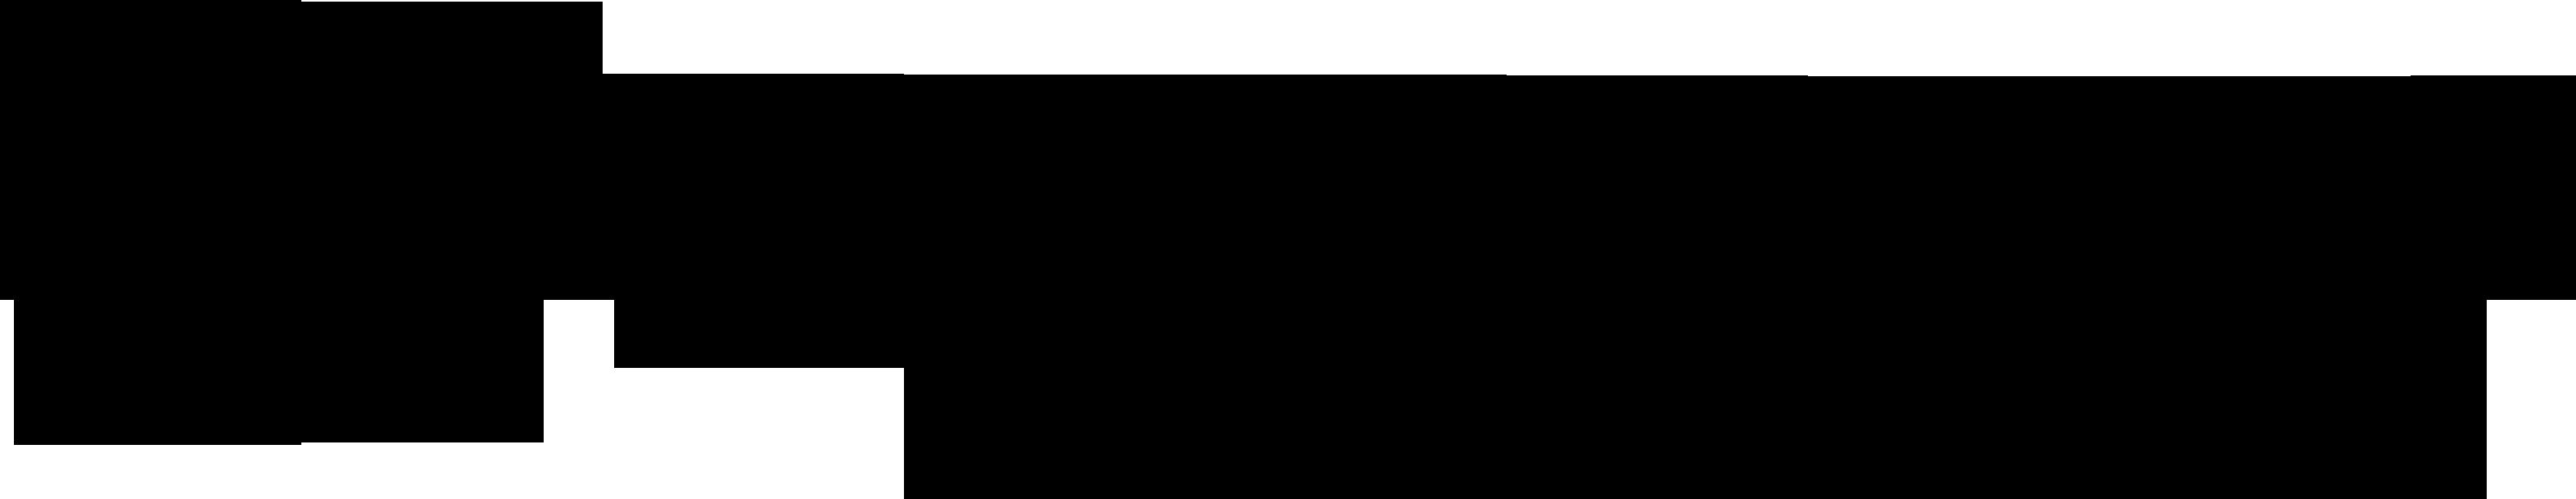 COEMAR logo